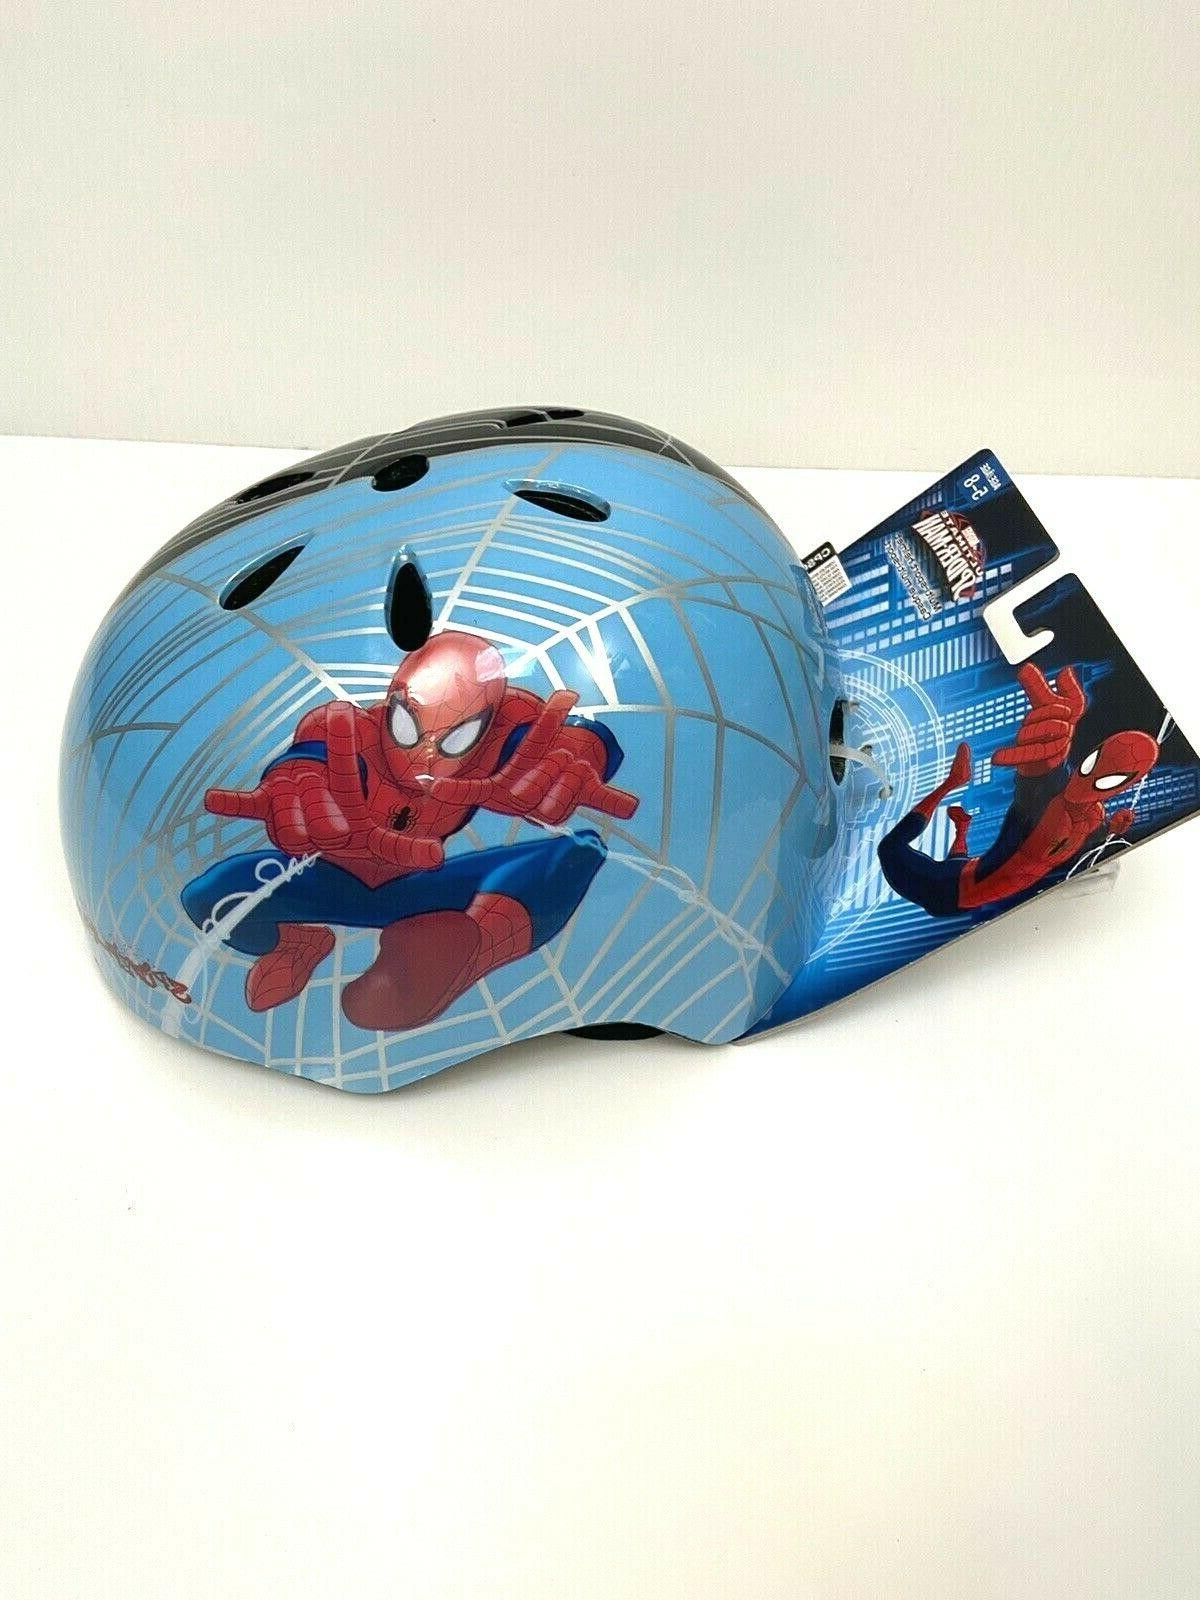 Bell Kids Spiderman Bike Helmet Ages 5-8 Two Tone Gear